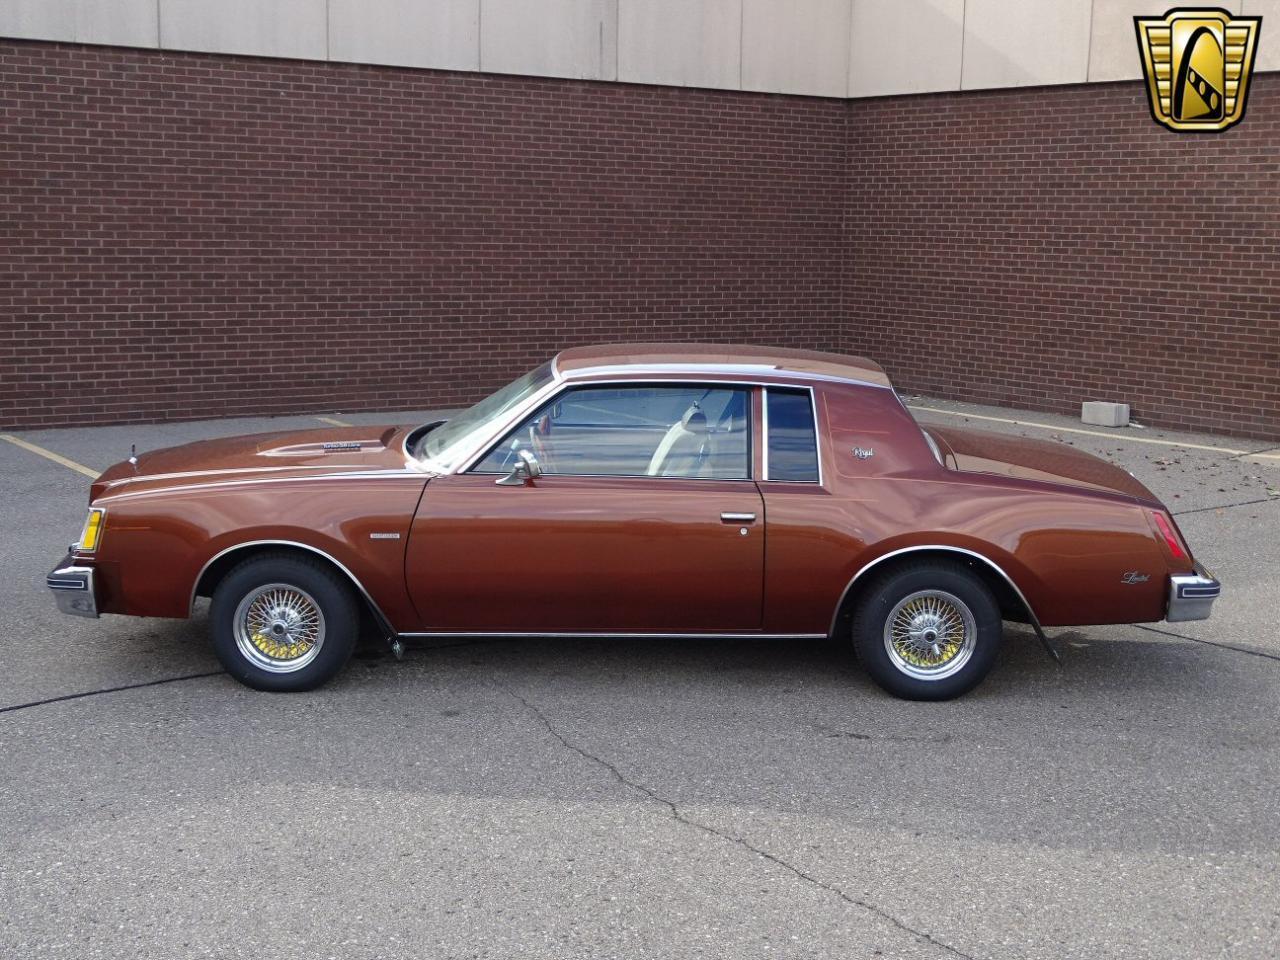 1978 buick regal for sale classiccars com cc 1027714 1978 buick regal for sale classiccars